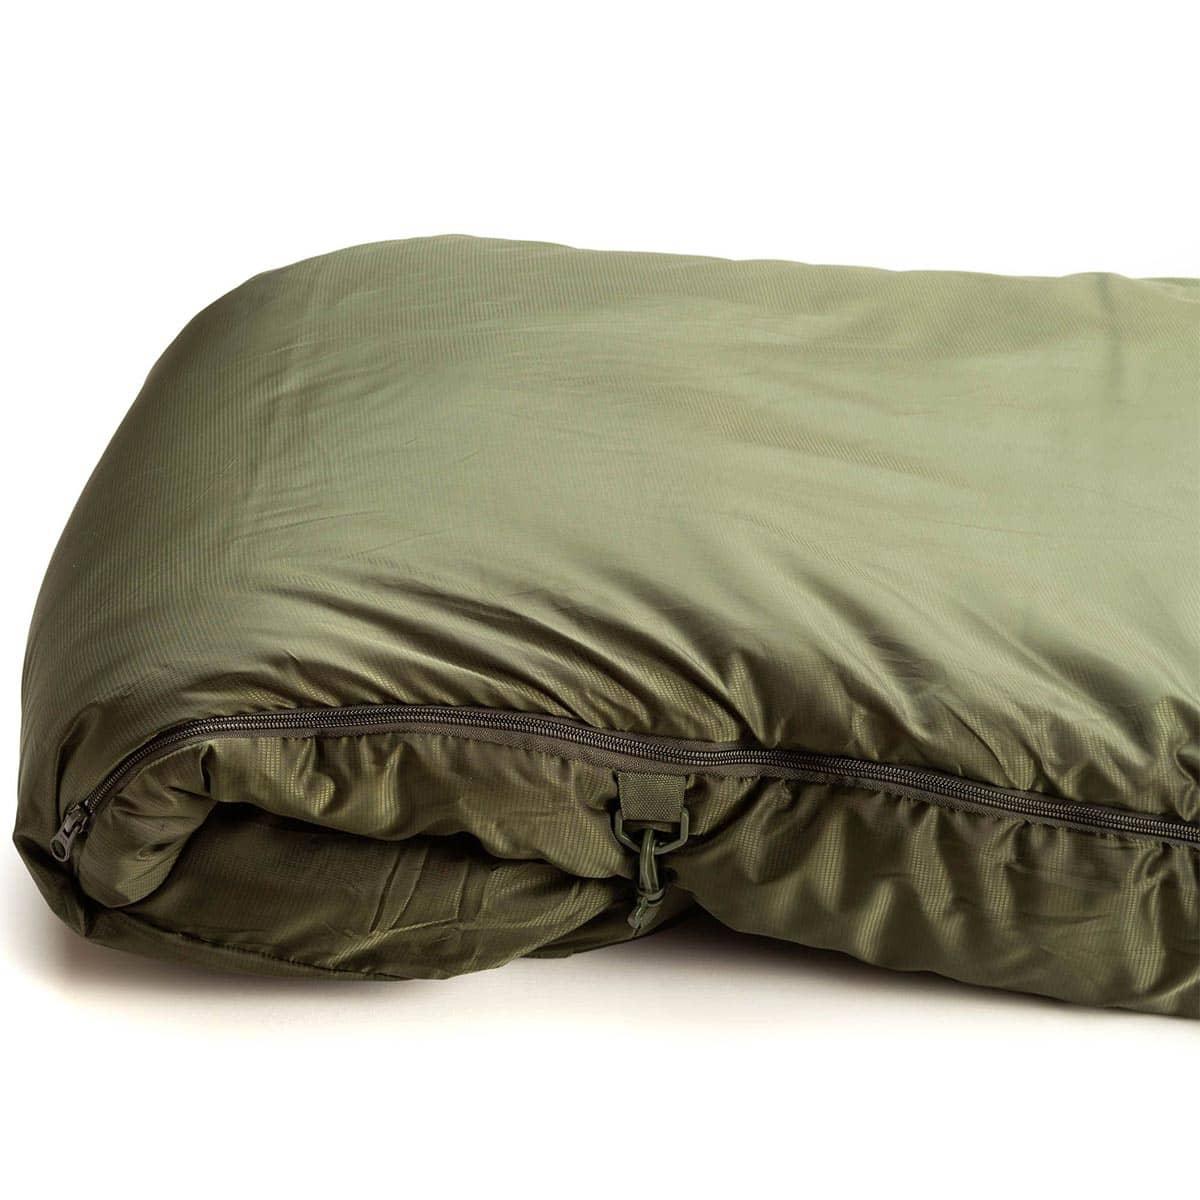 Snugpak Softie Elite 4 XL Sleeping Bag